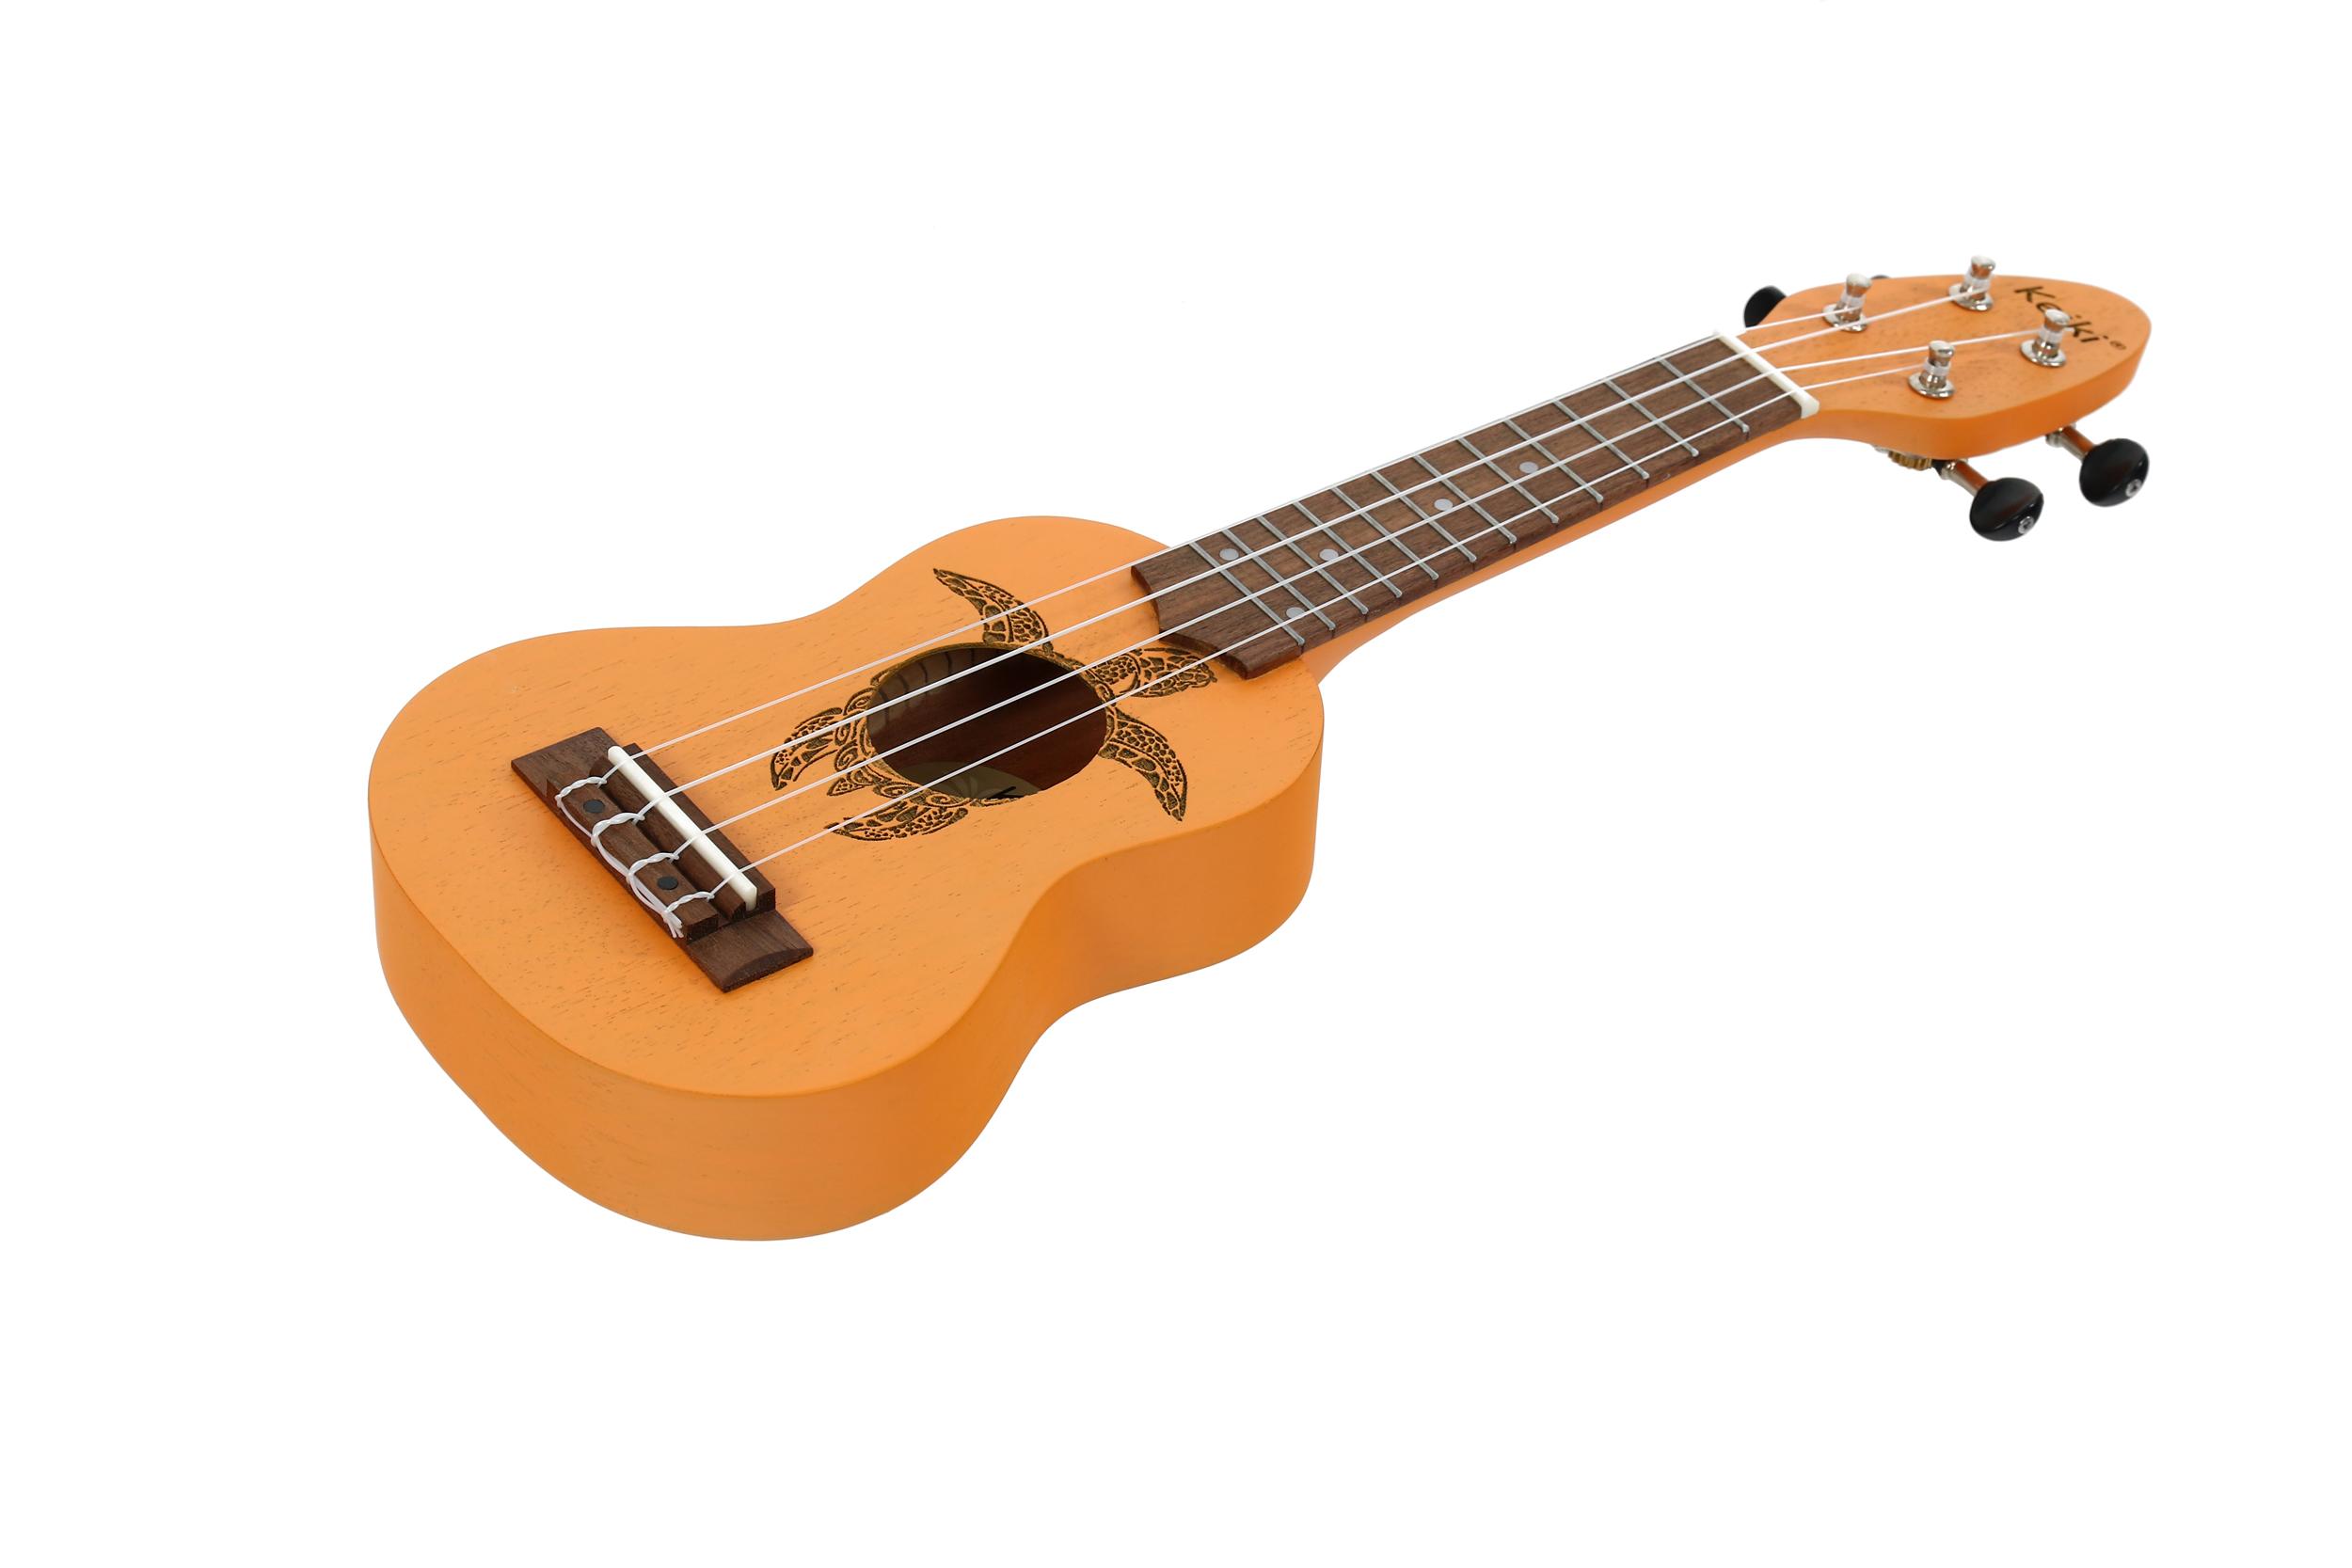 Ortega_Keiki K1-ORG_Ukulelen_8_Guitar Shop Corda